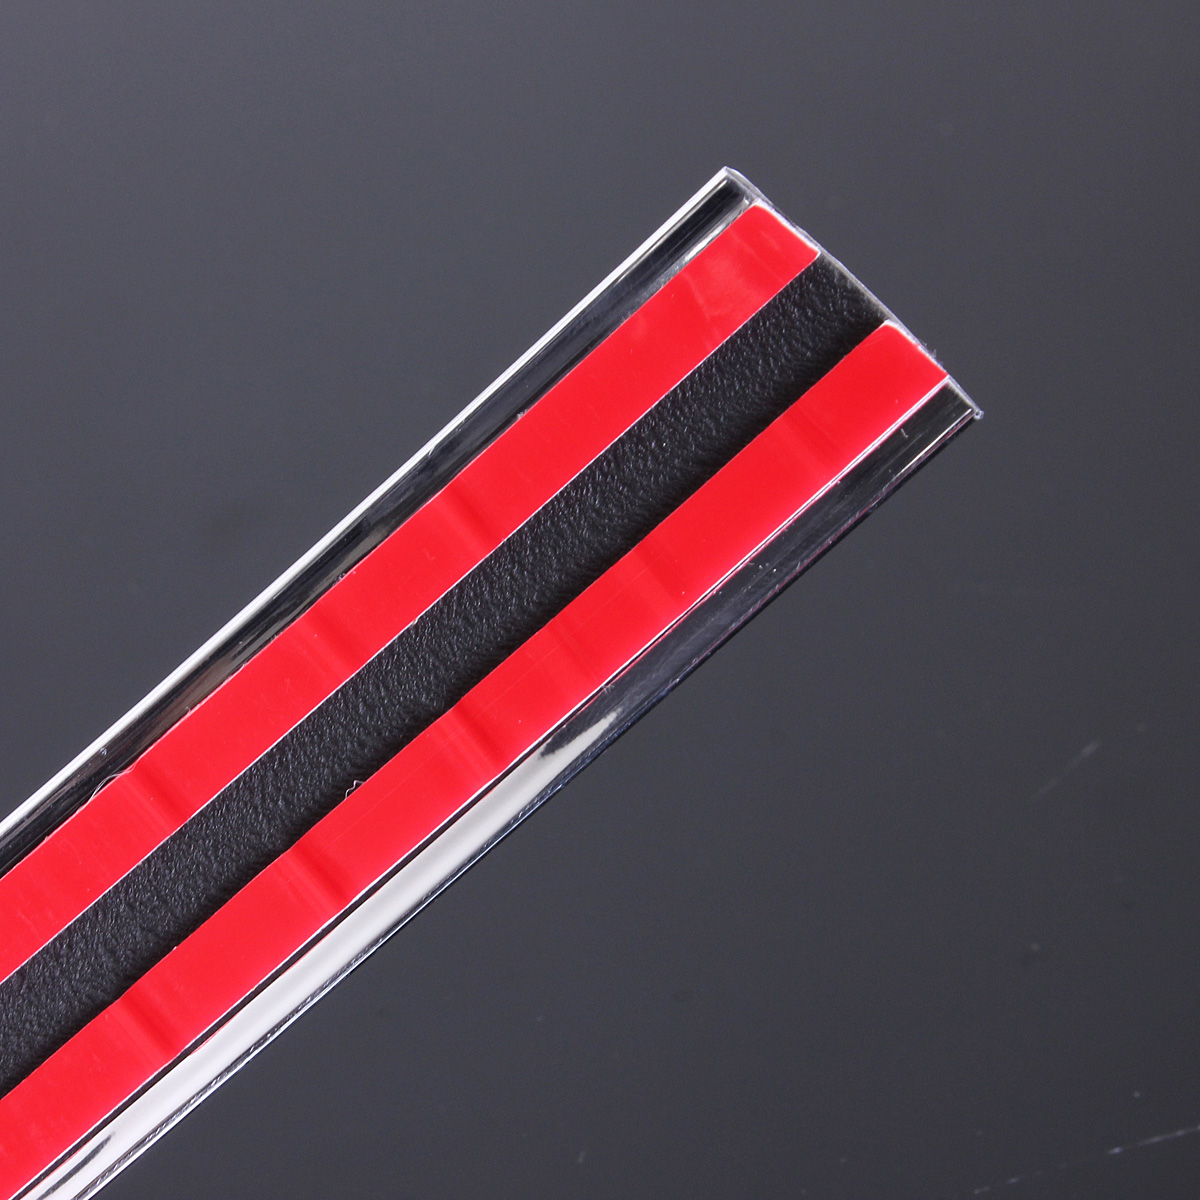 16ft 5m flexible auto car door moulding scratch protector strip edge guard trim ebay. Black Bedroom Furniture Sets. Home Design Ideas